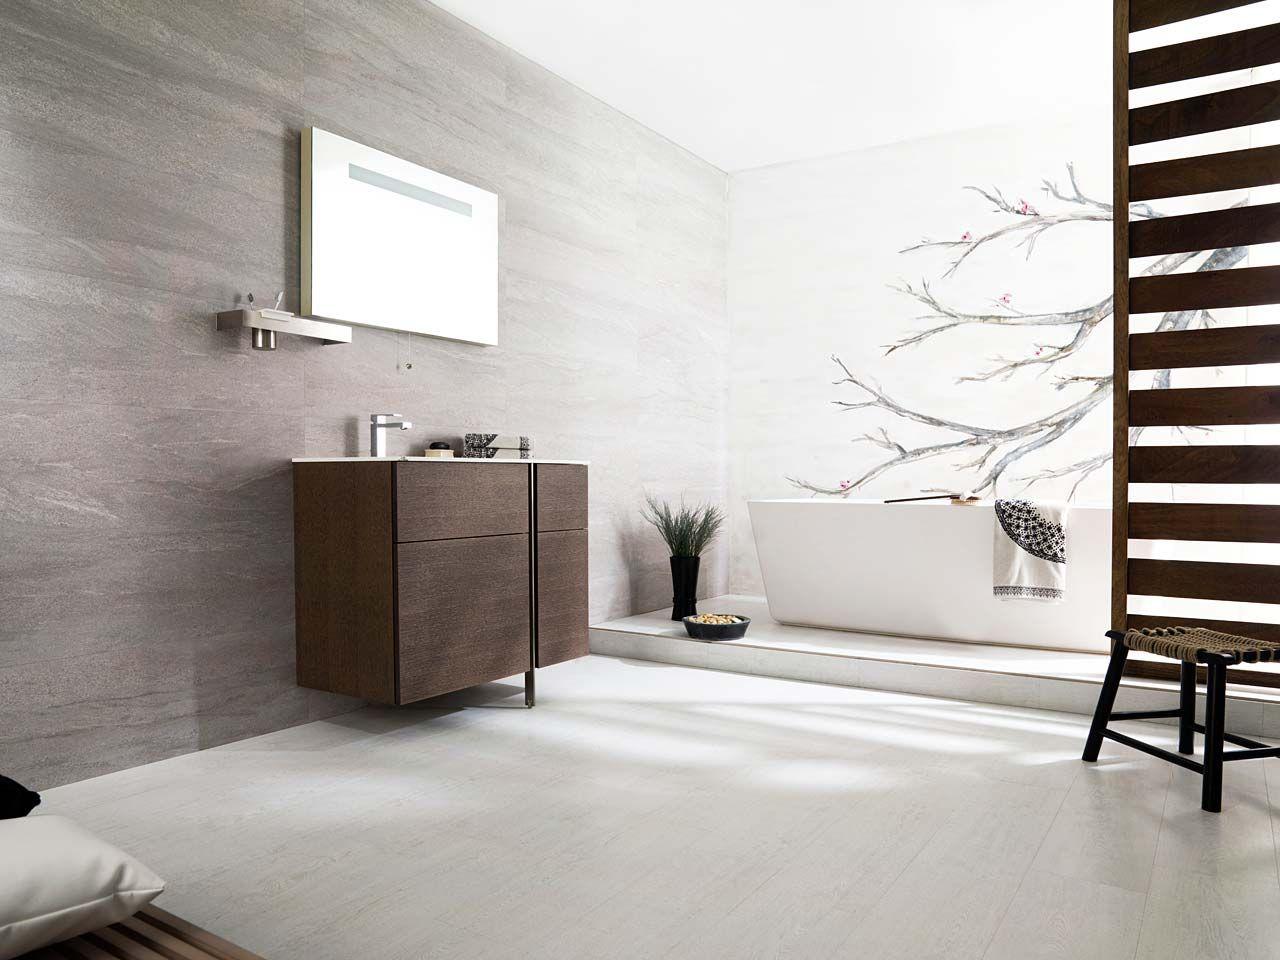 Bath Desing Porcelanosa Modern Bathroom Vanity Bathroom Trends Bathroom Vanity